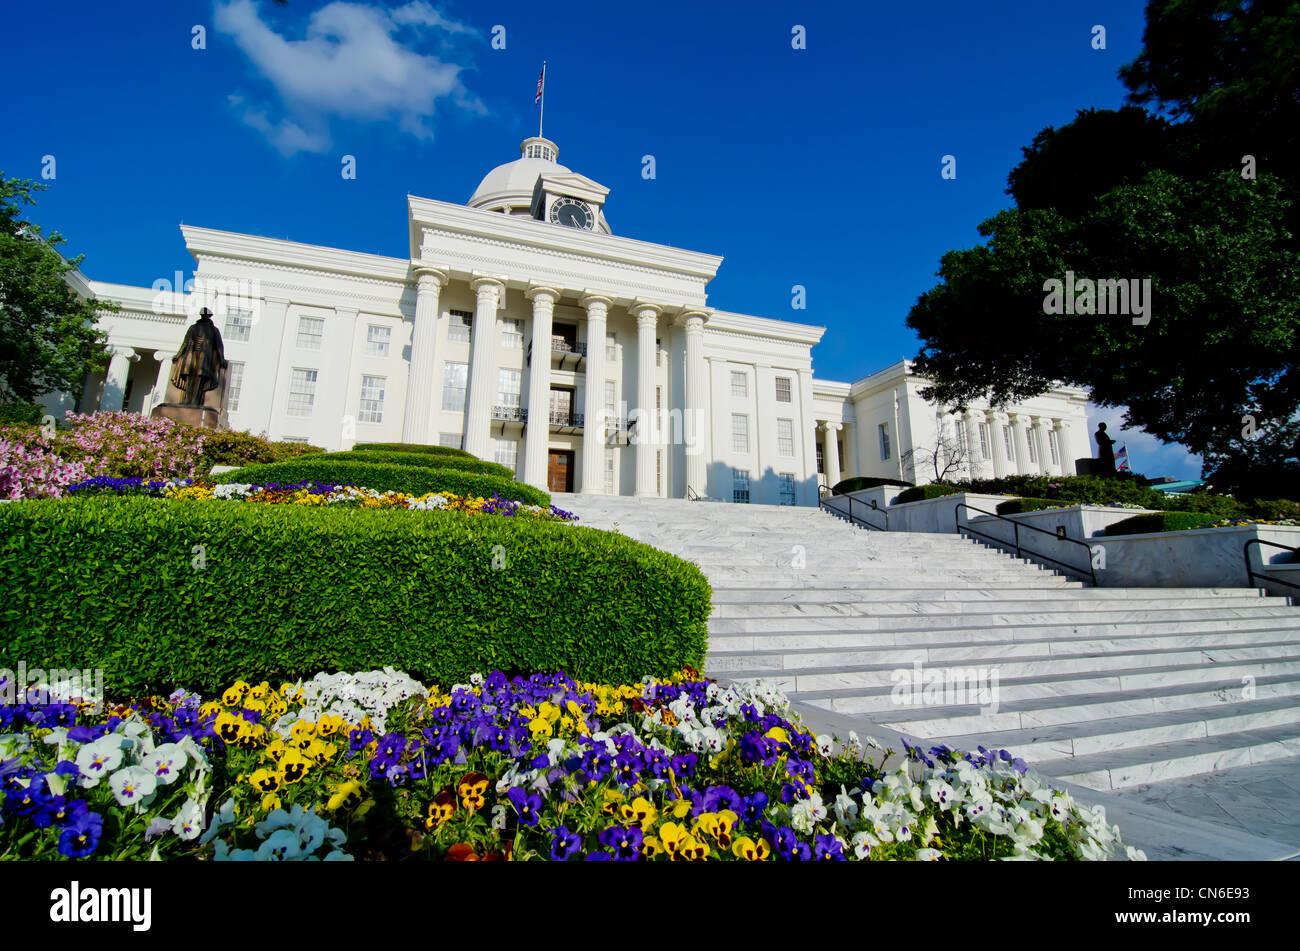 Alabama State Capitol - Stock Image